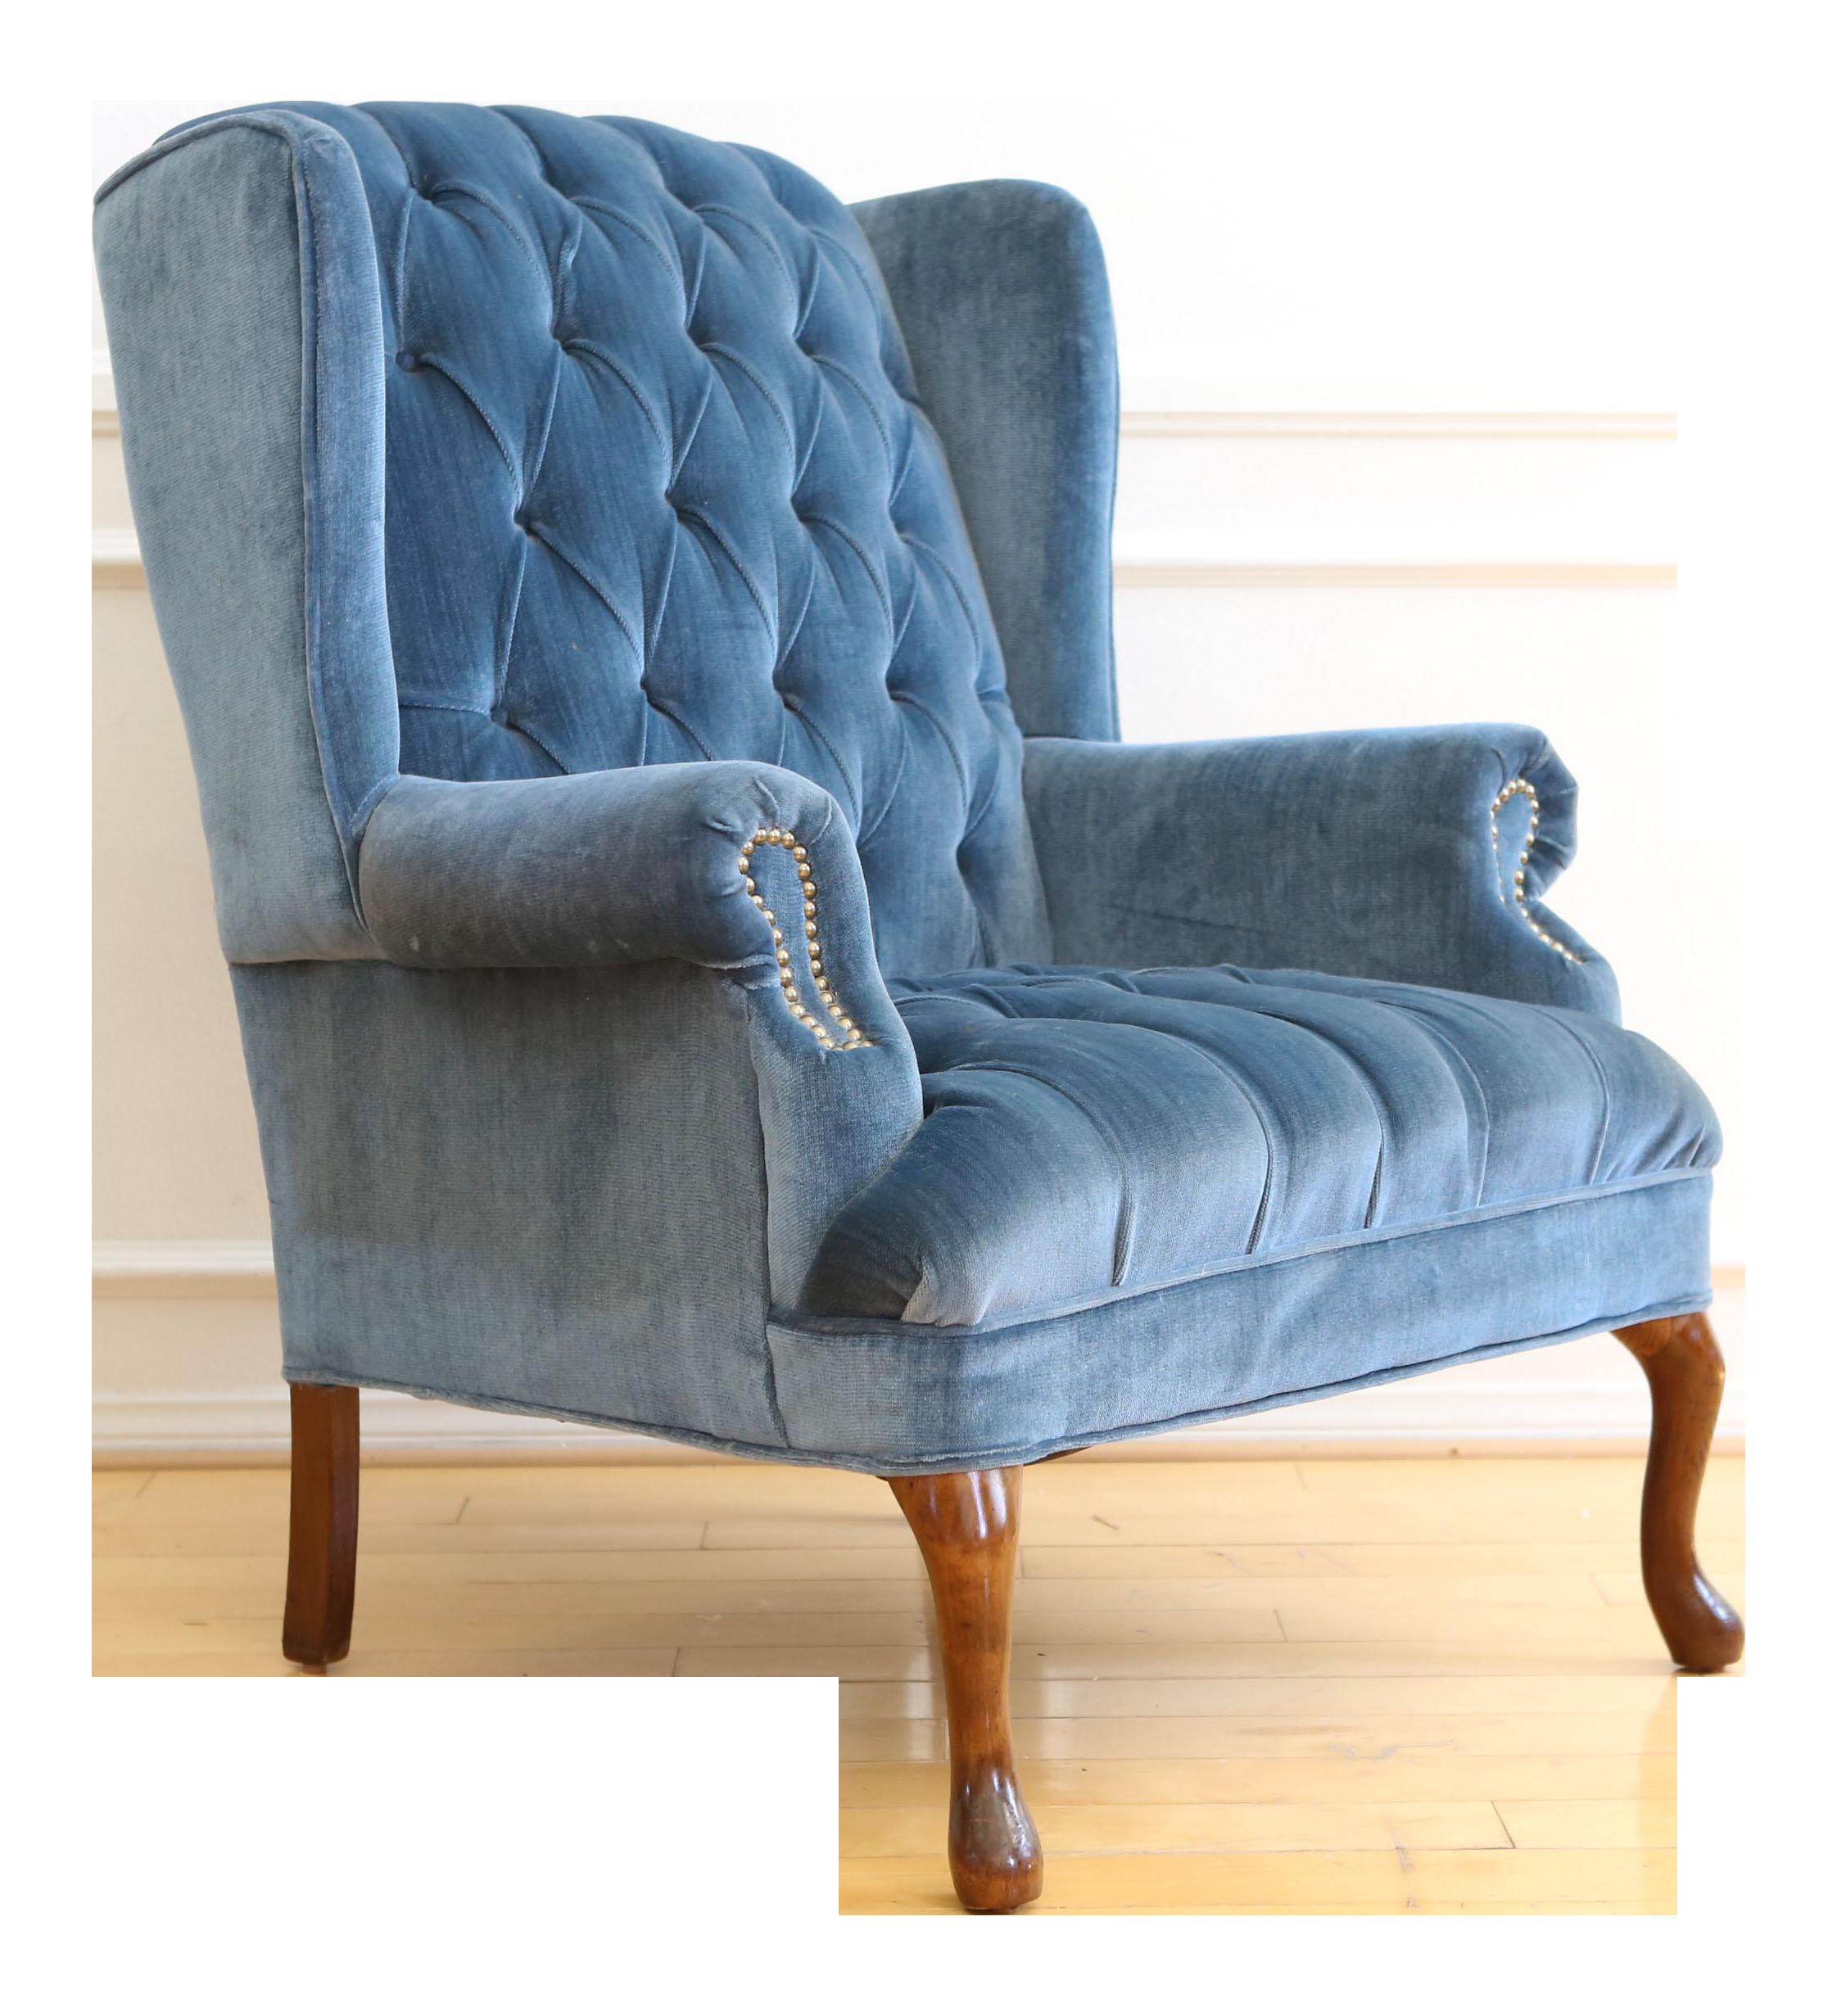 Vintage Blue Navy Tufted Velvet Wingback Chair Chairish